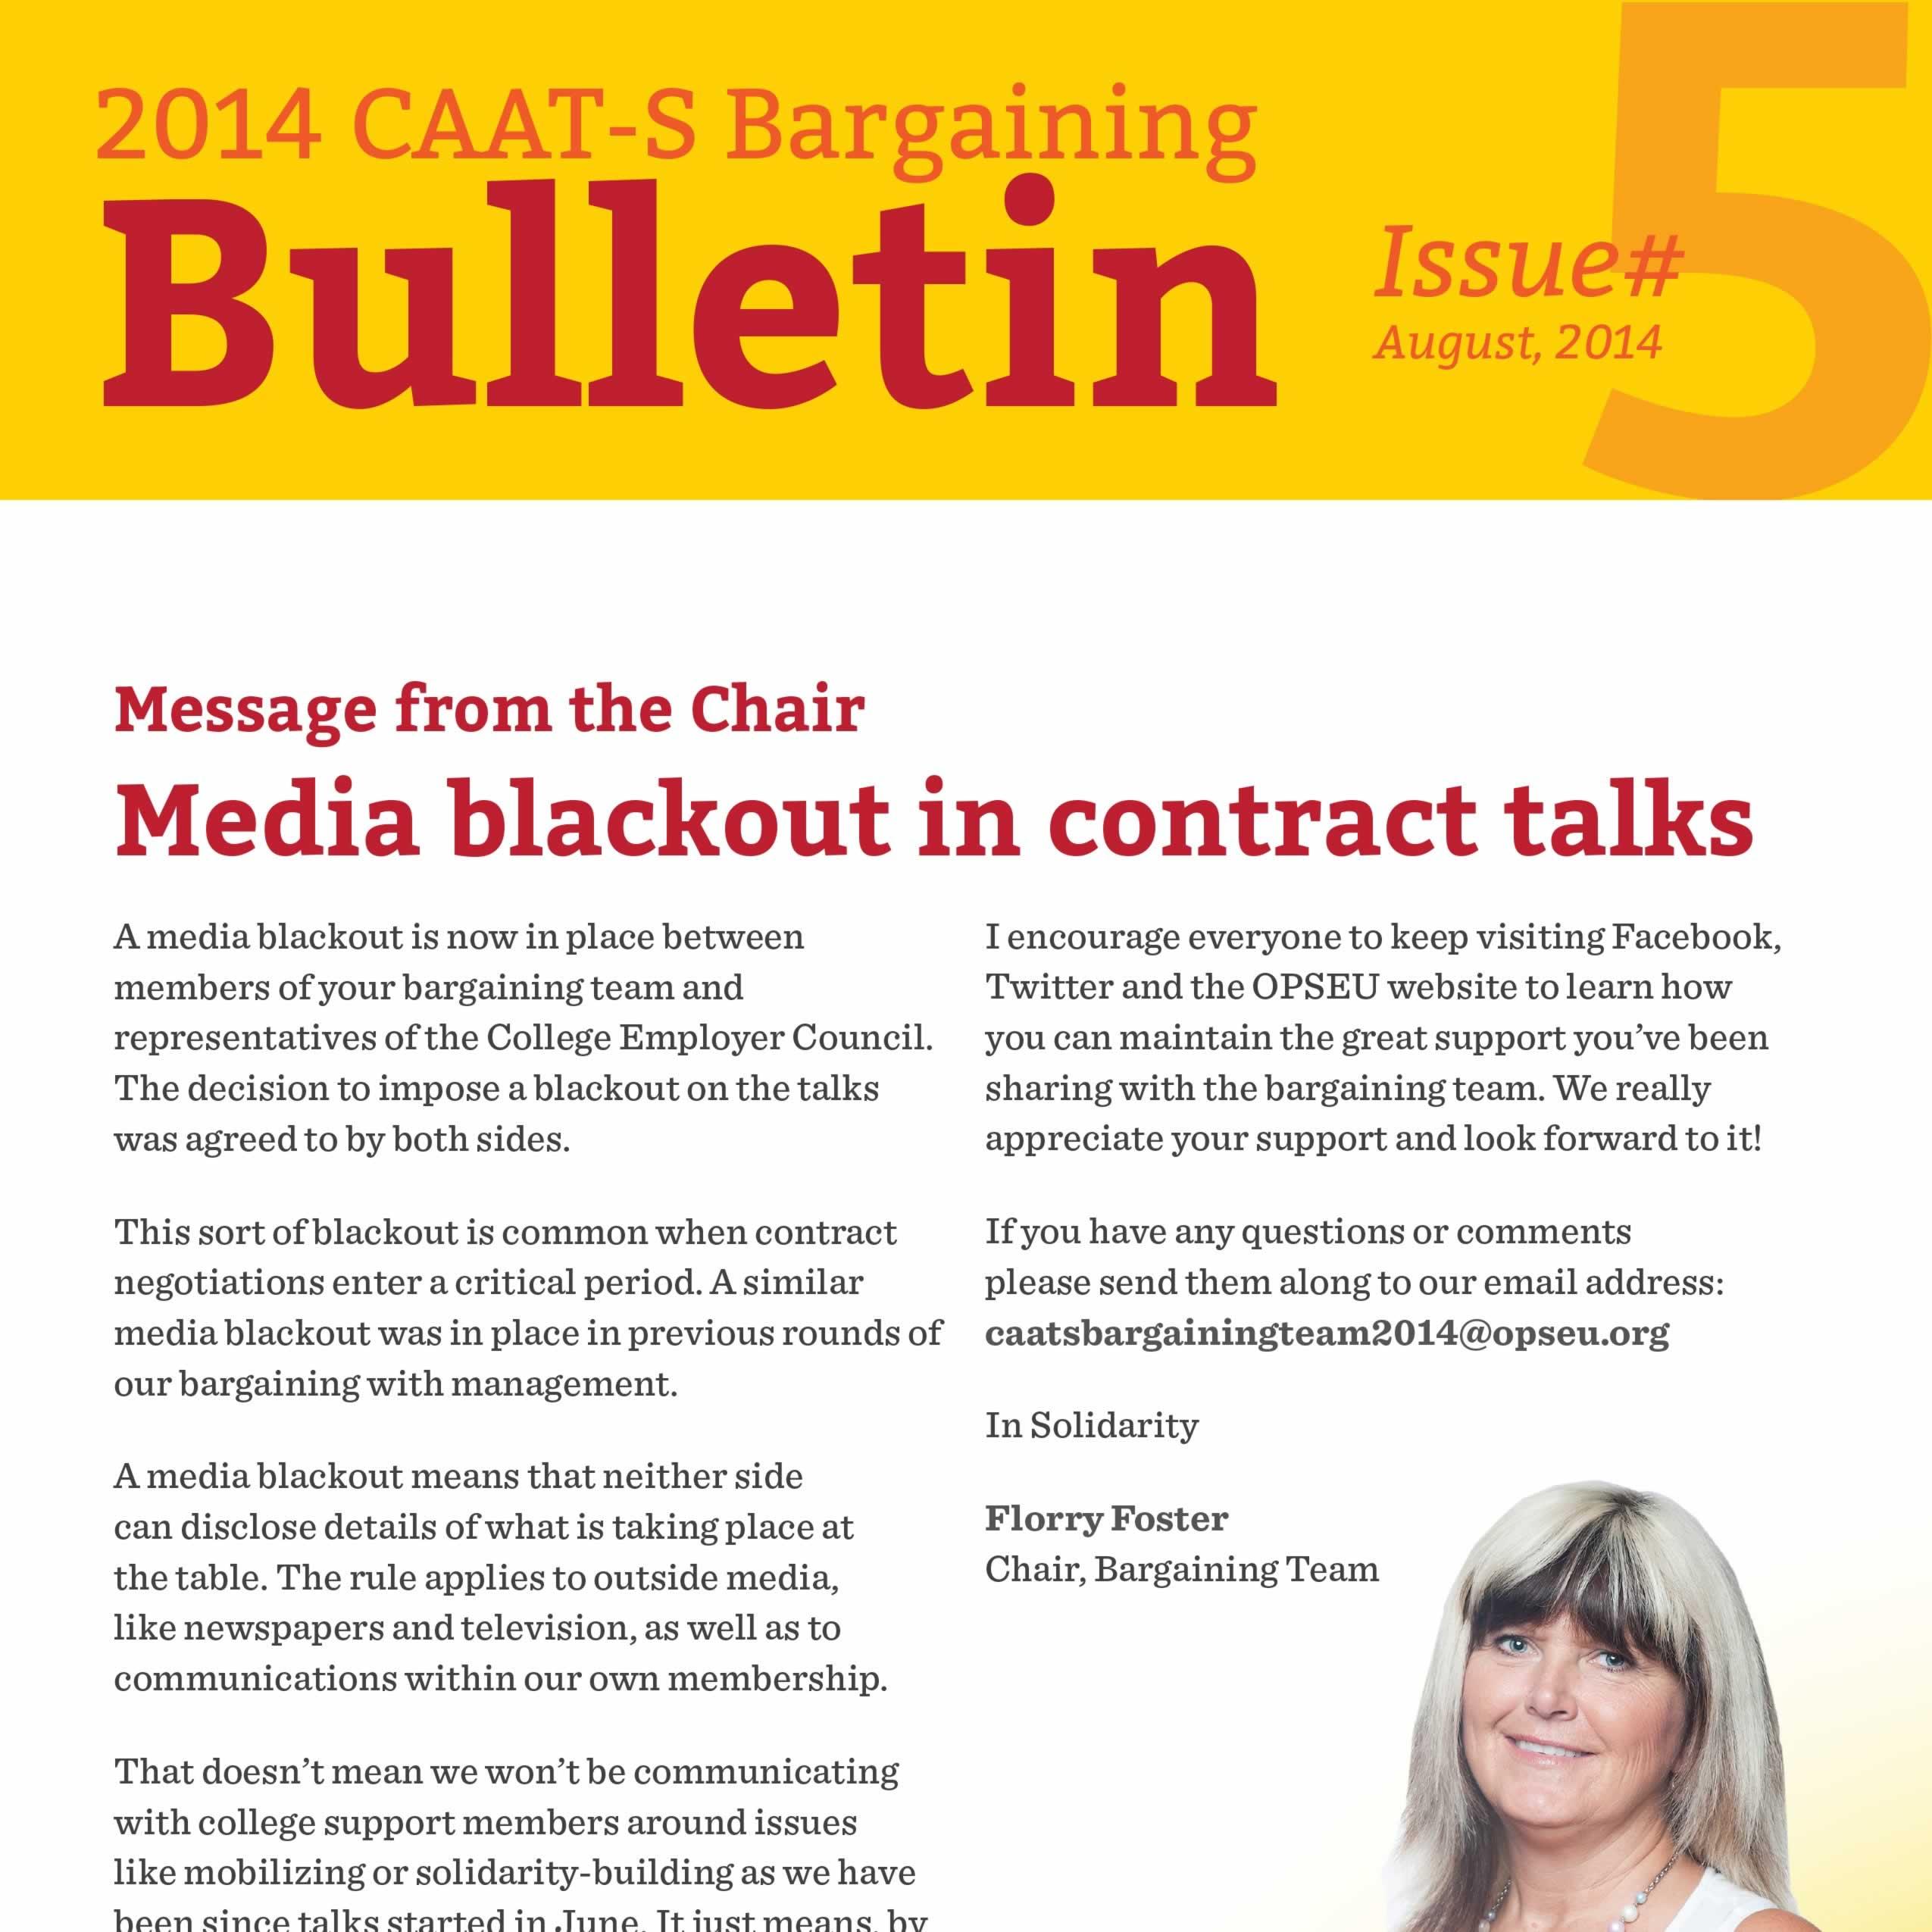 2014 CAAT-S Bargaining Bulletin Issue 5